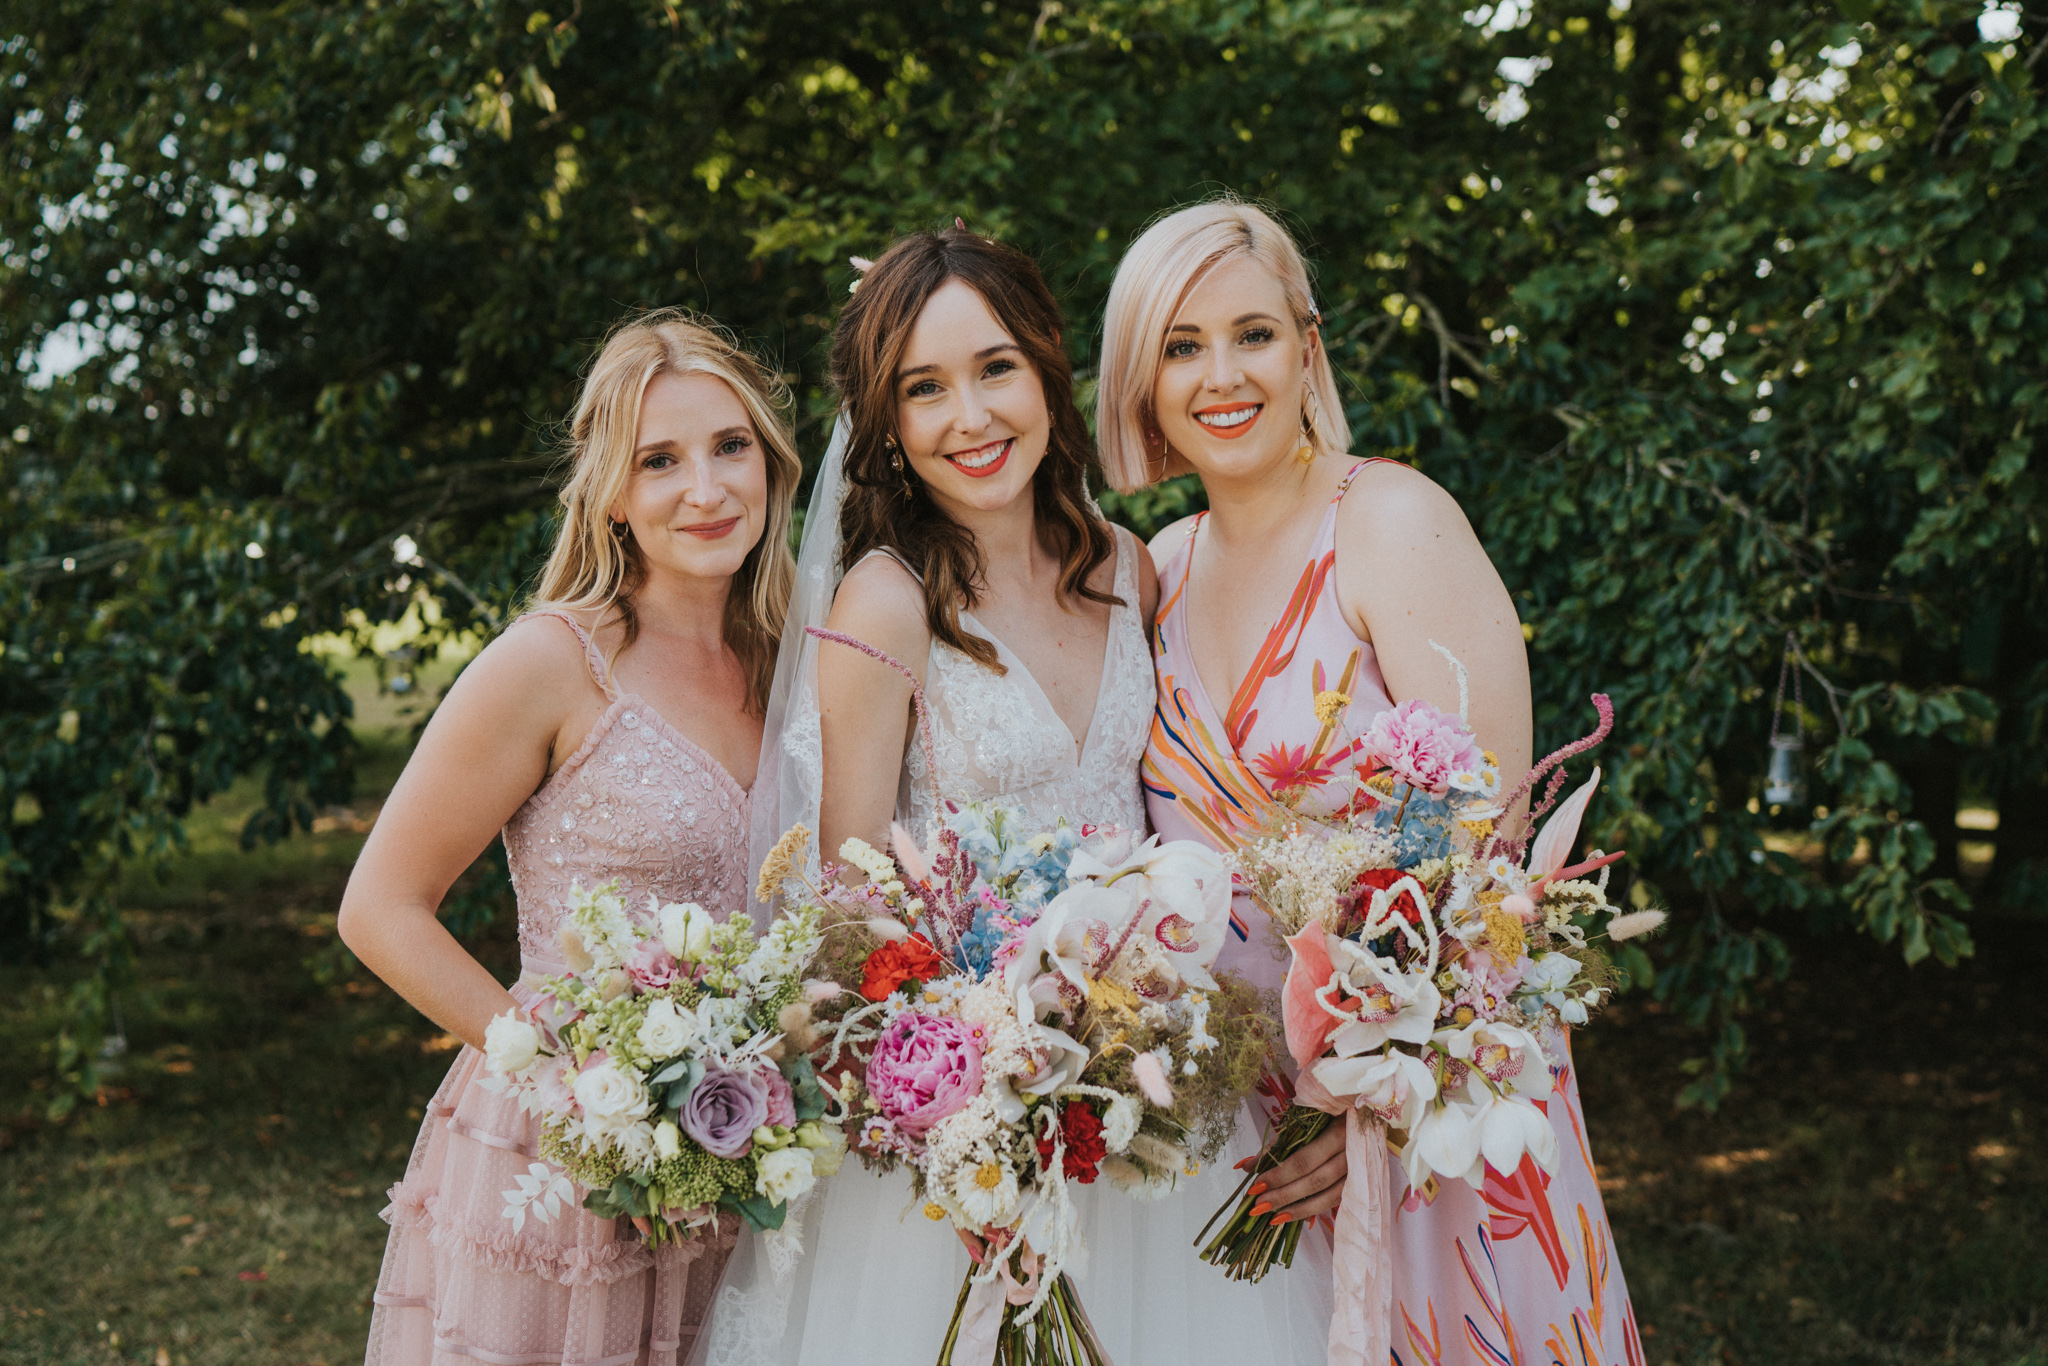 emi-Jack-boho-diy-wedding-eggington-house-grace-elizabeth-colchester-essex-alternative-wedding-photographer-suffolk-norfolk-devon (27 of 56).jpg